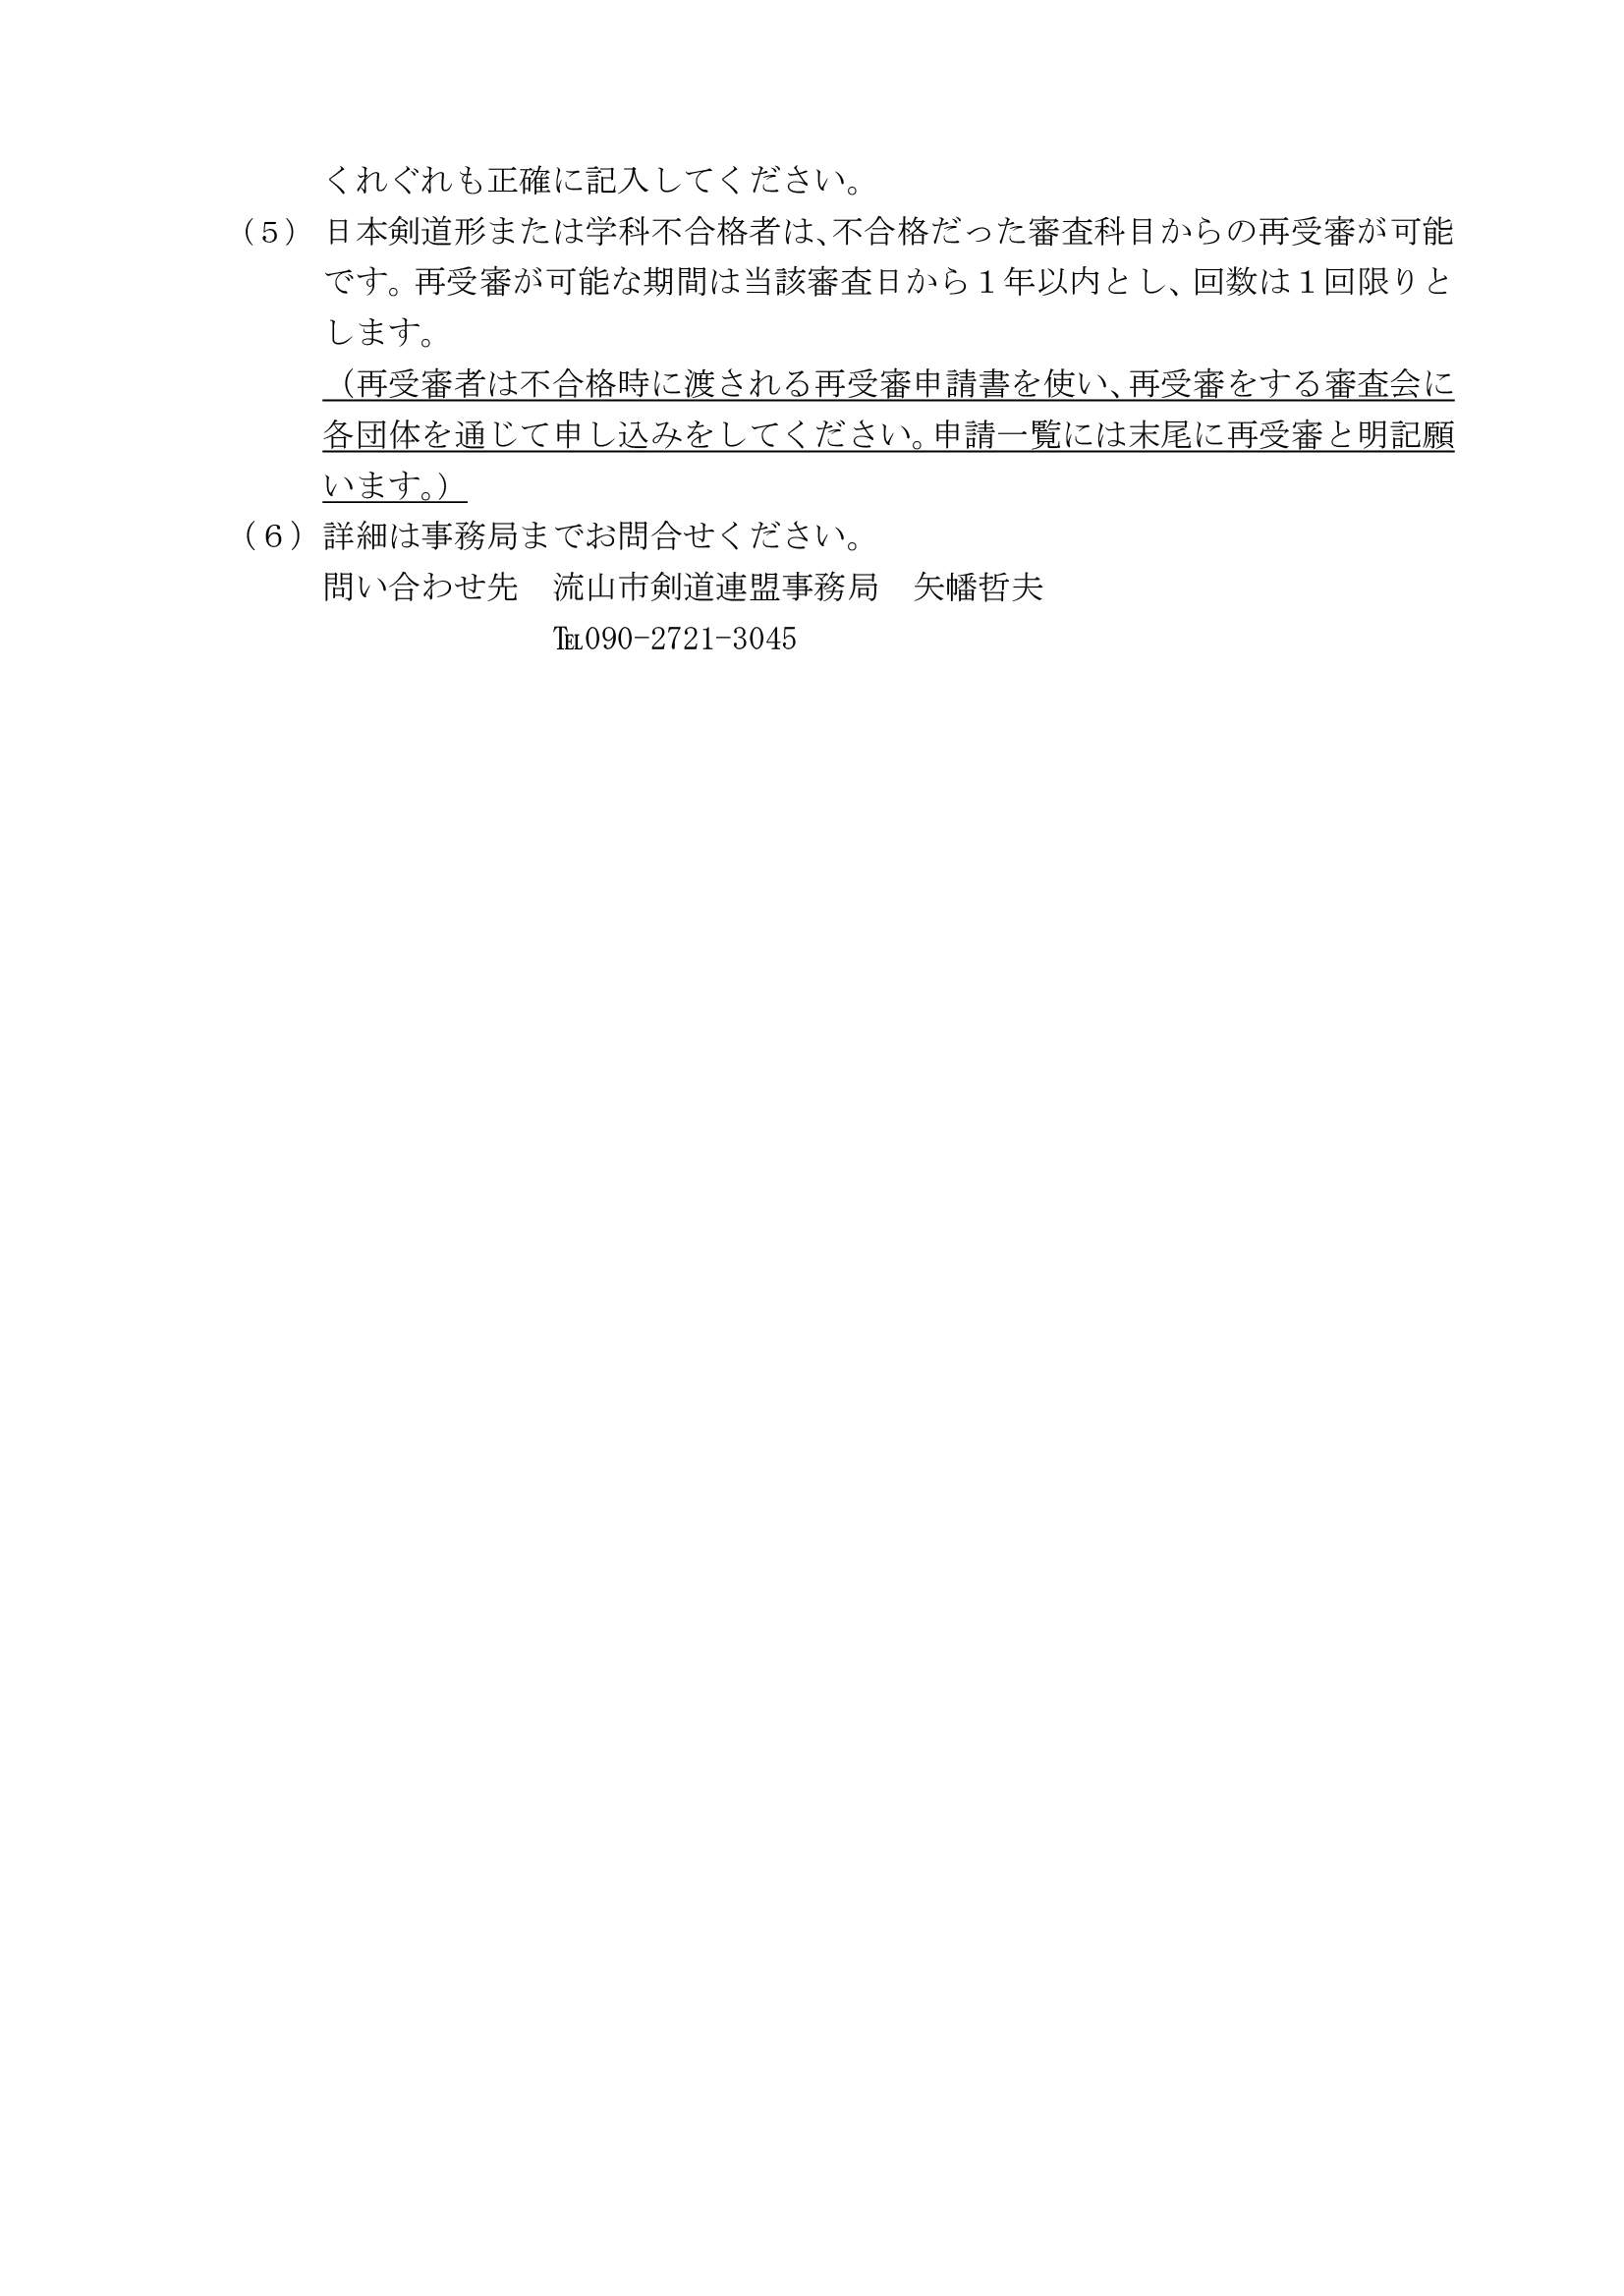 三市審査会市内通知R元.7.7 ホームページ用_0003